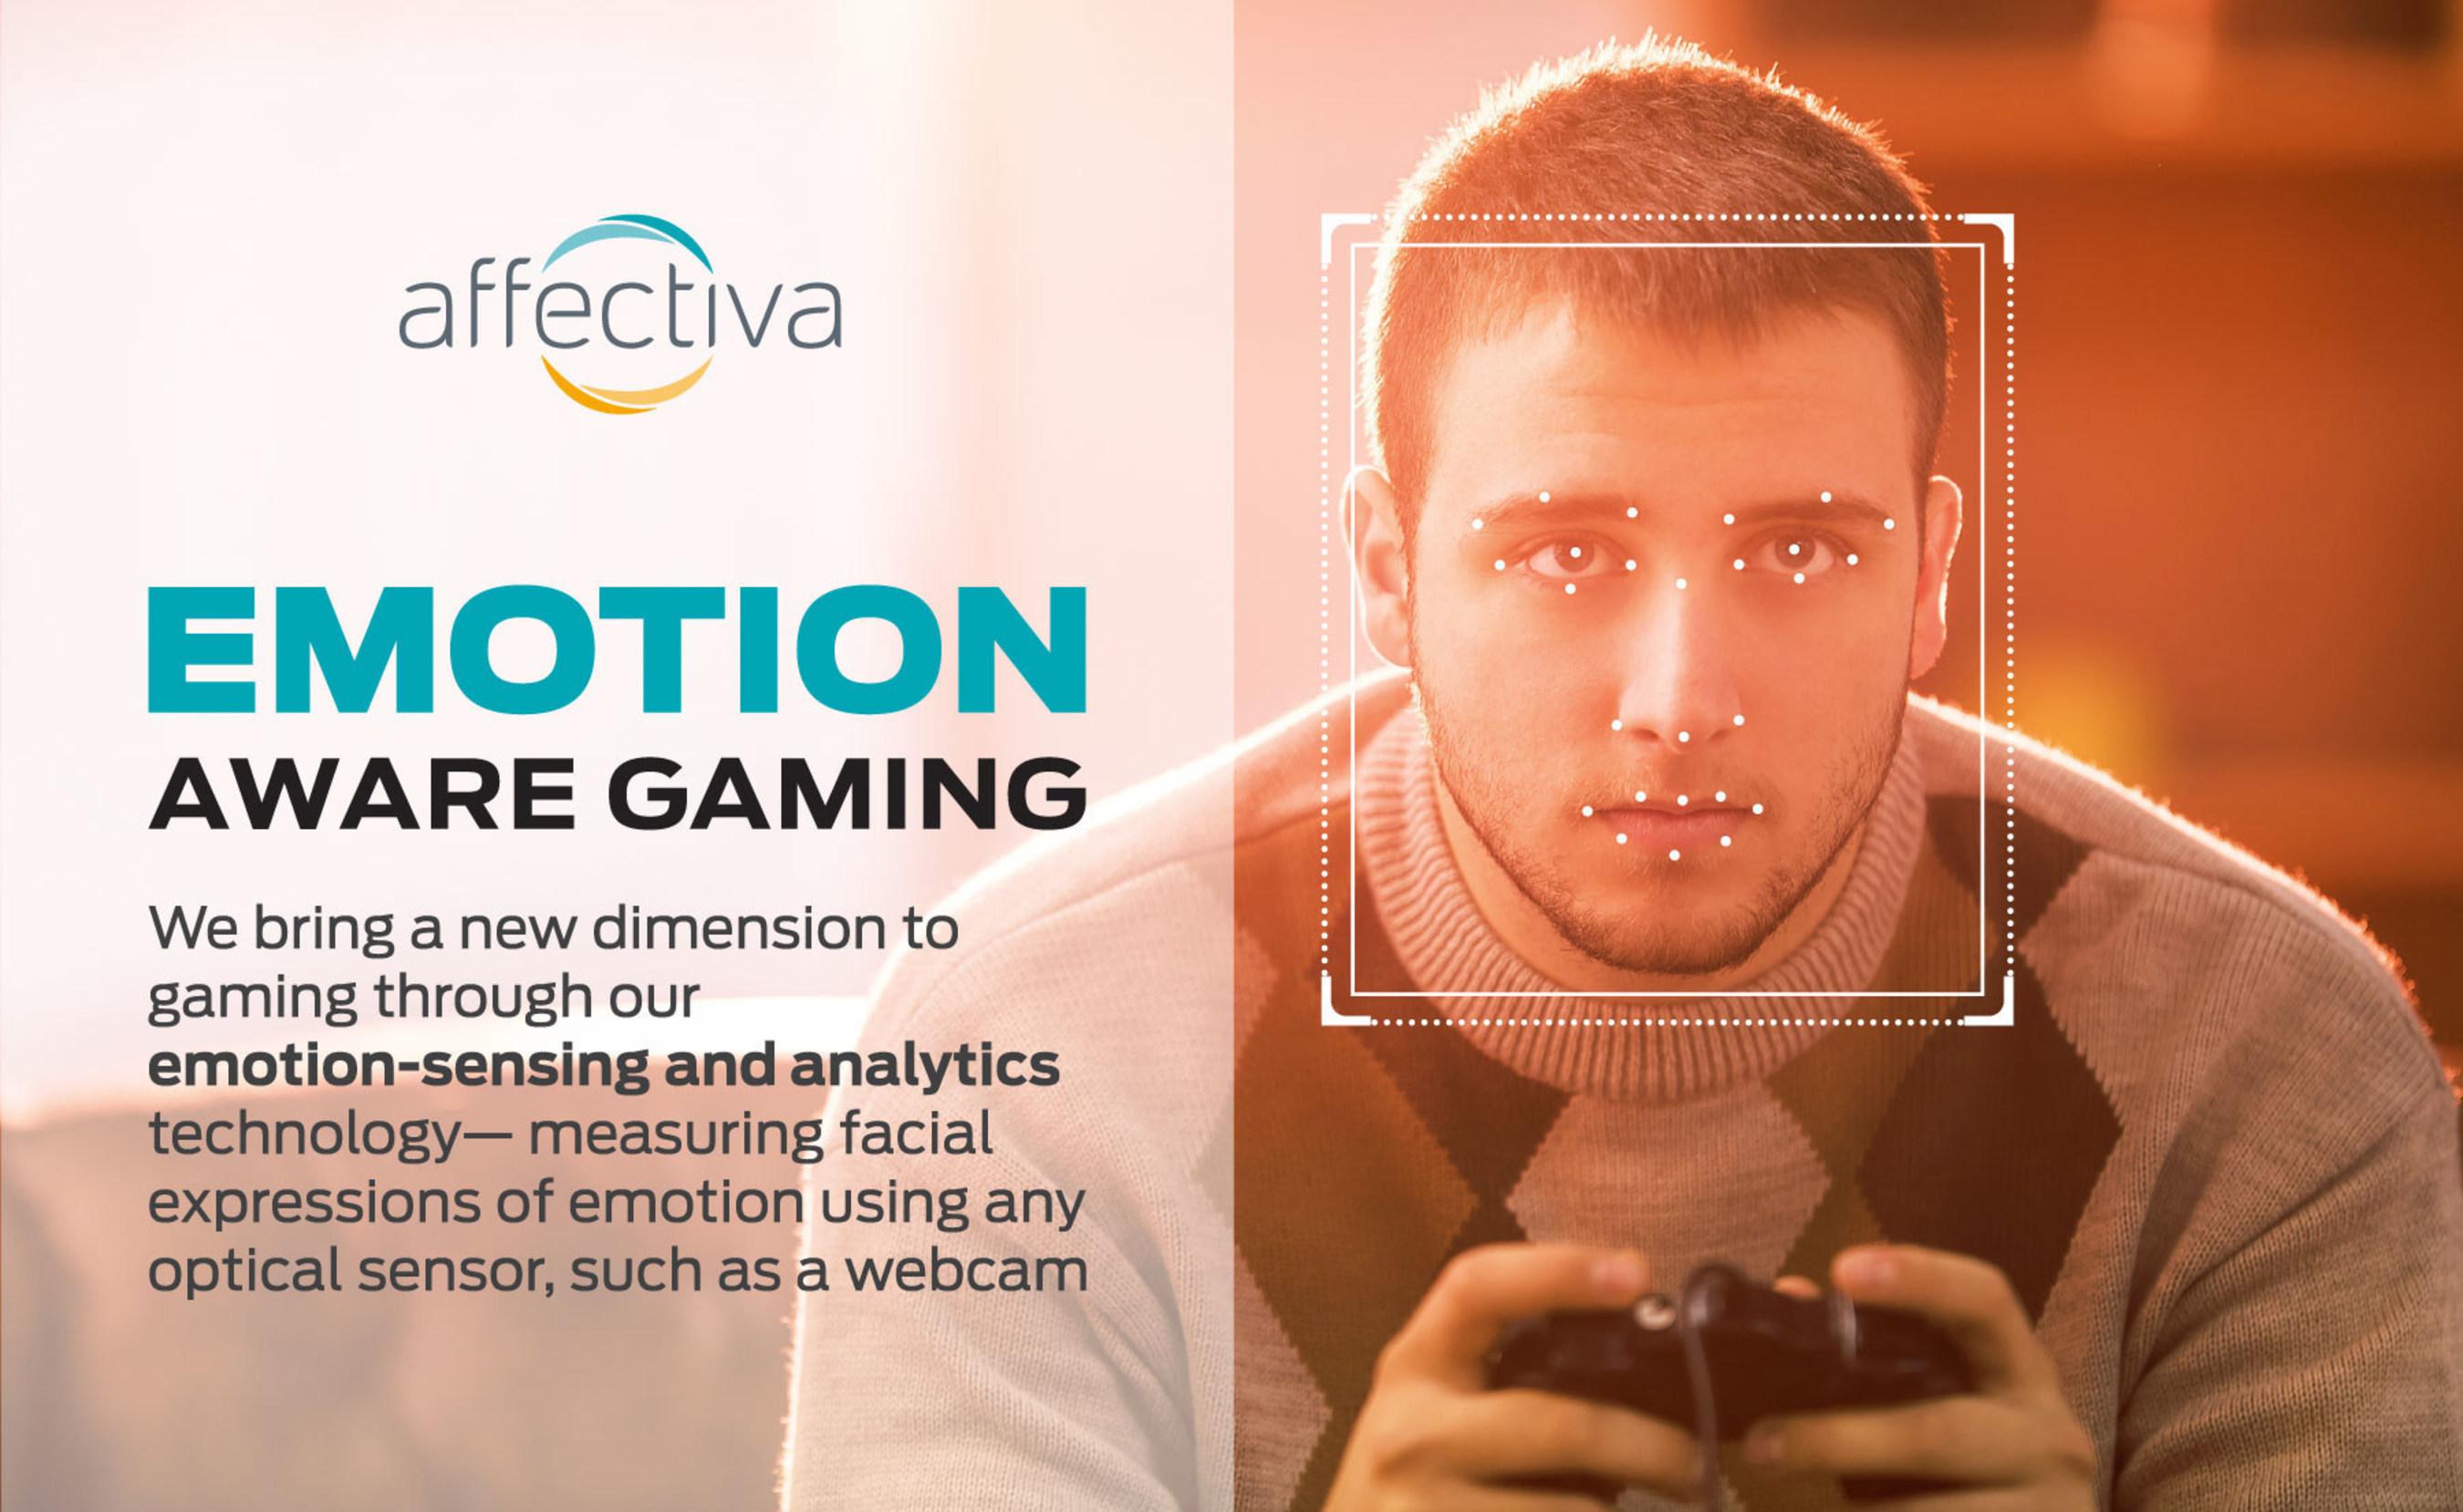 Affectiva powers emotion-aware gaming